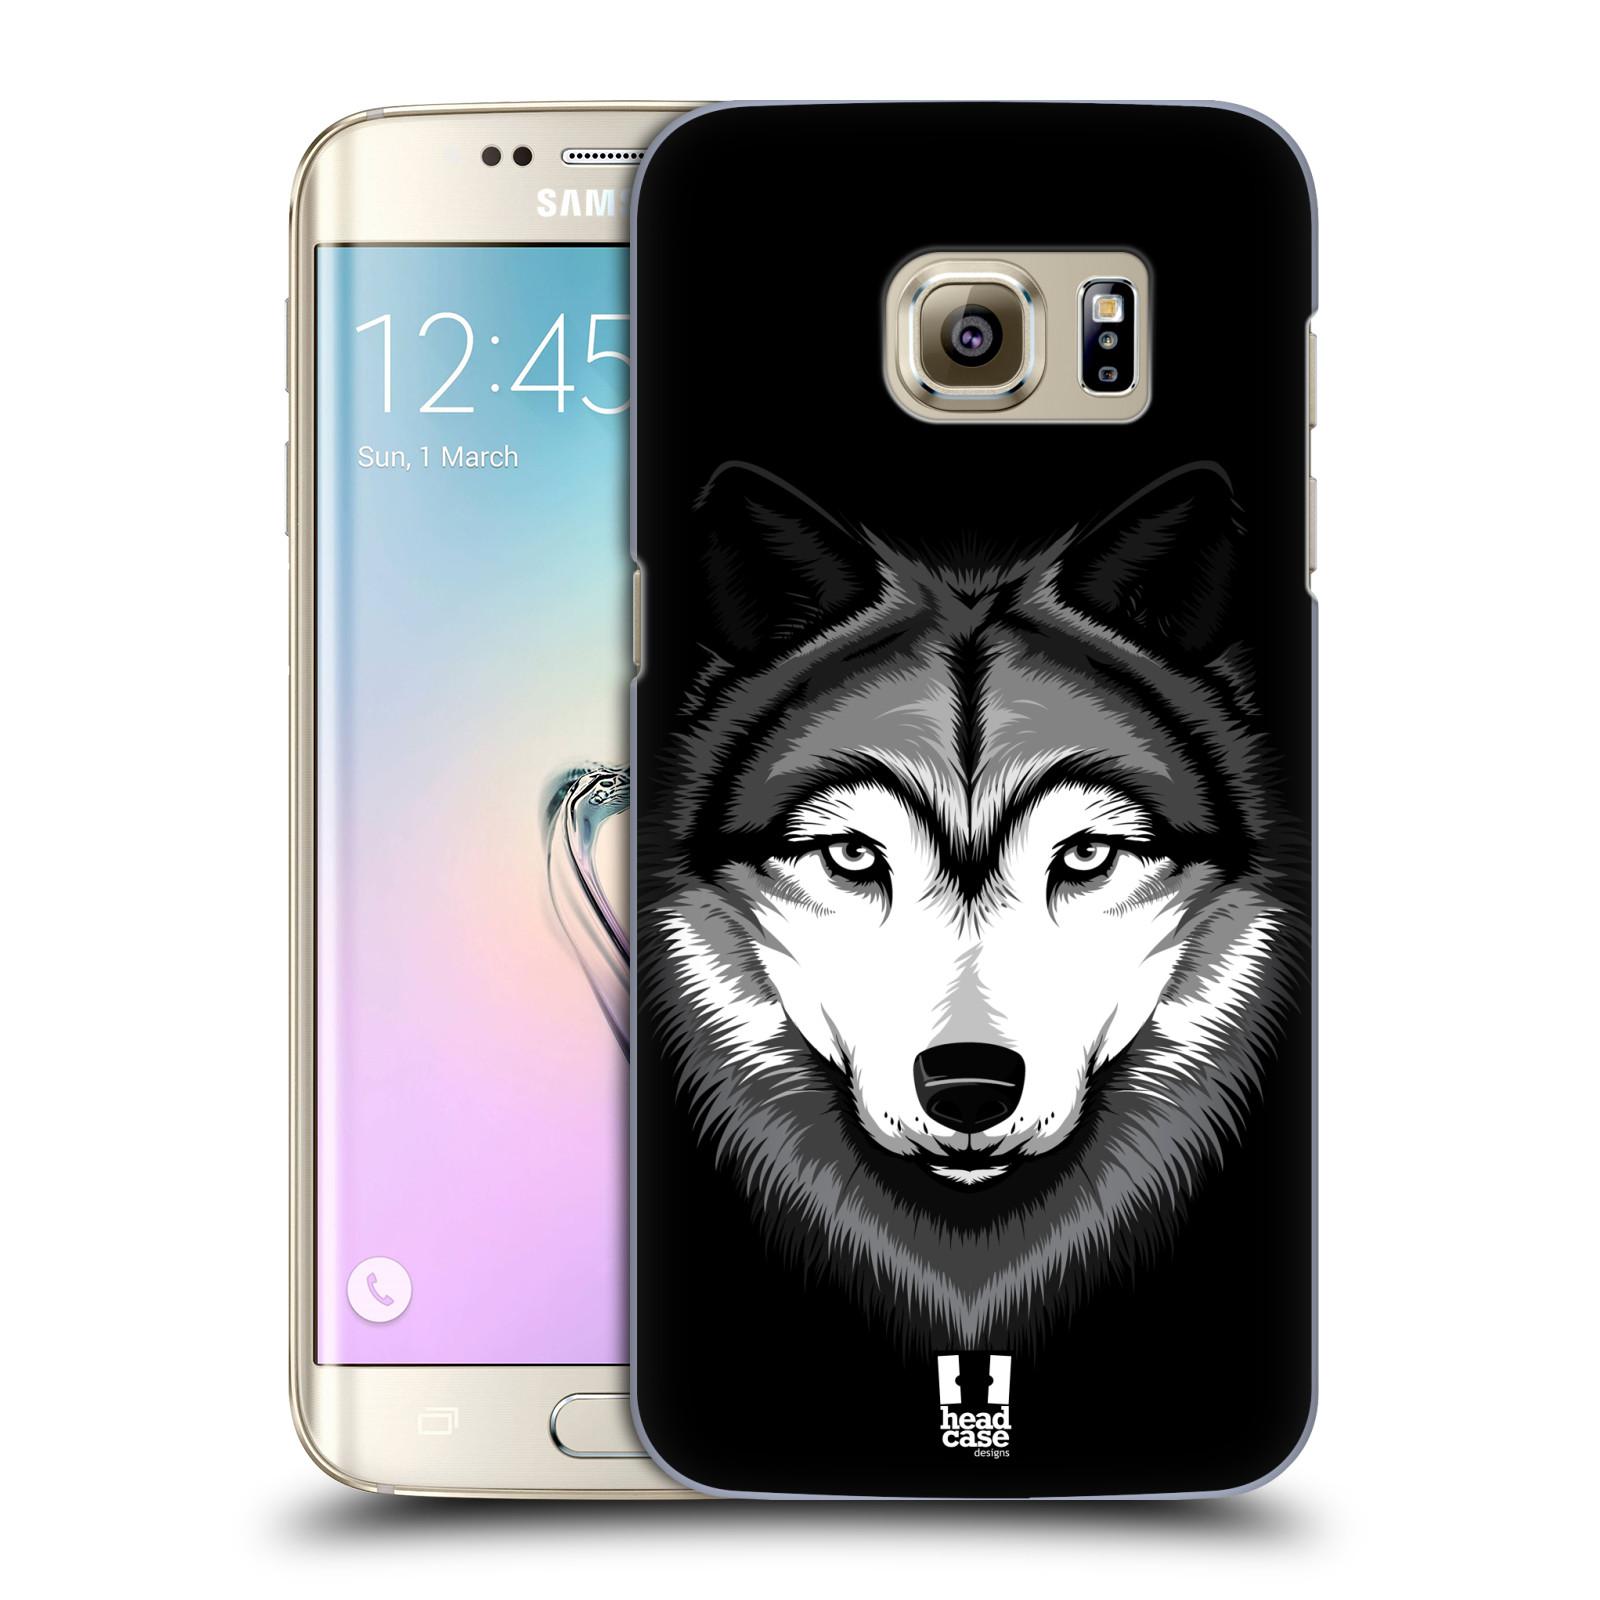 HEAD CASE plastový obal na mobil SAMSUNG GALAXY S7 EDGE vzor Zvíře kreslená tvář 2 vlk